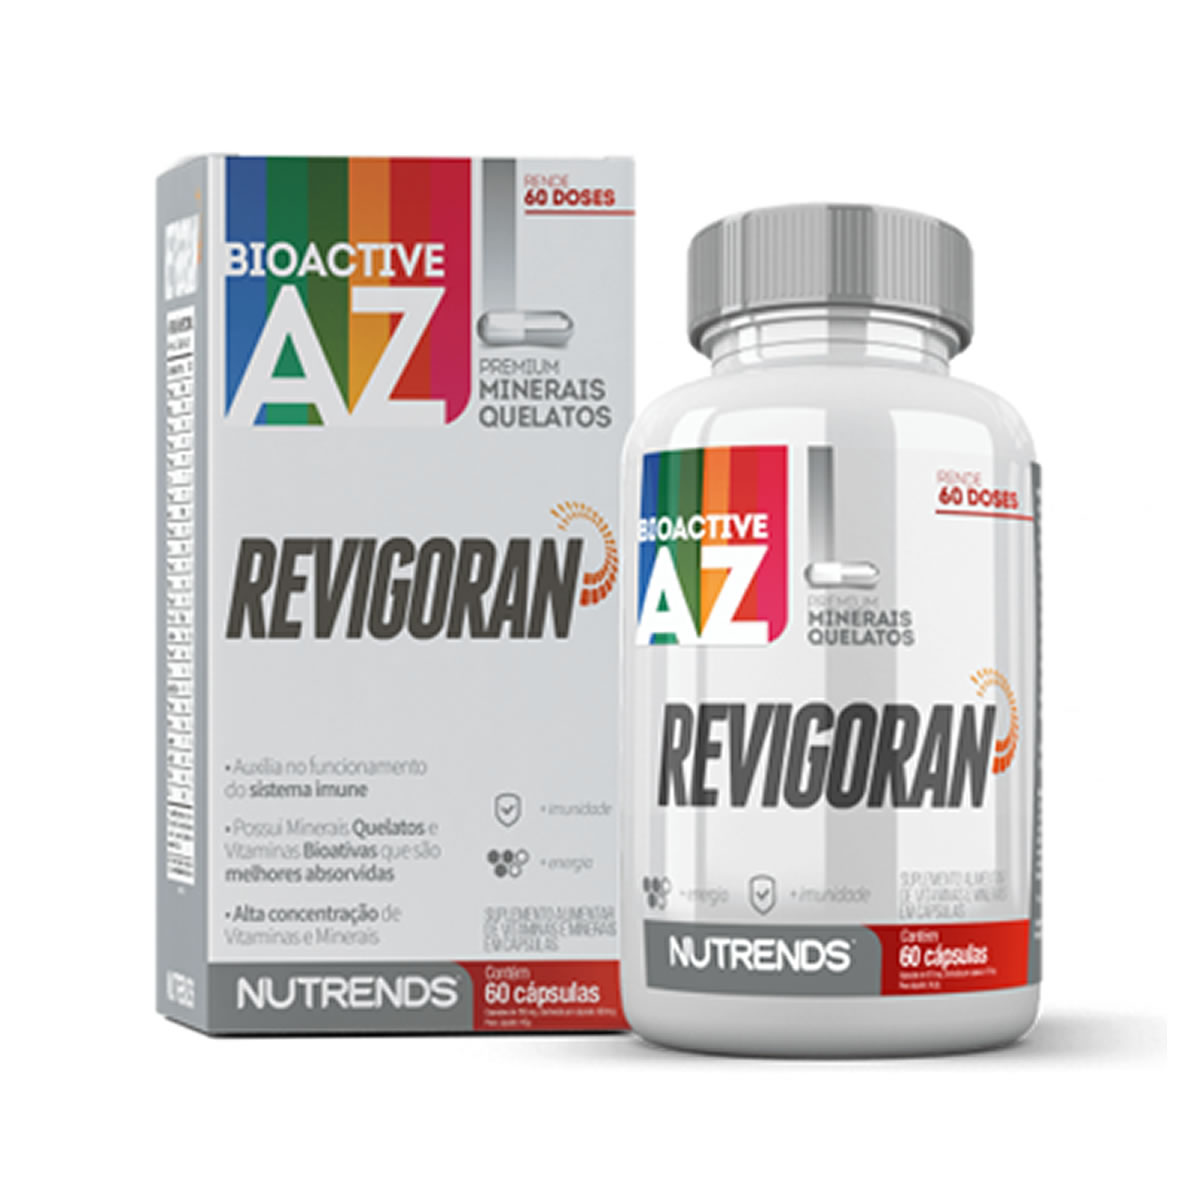 Bioactive A-Z Revigoran 60 Cápsulas - Nutrends